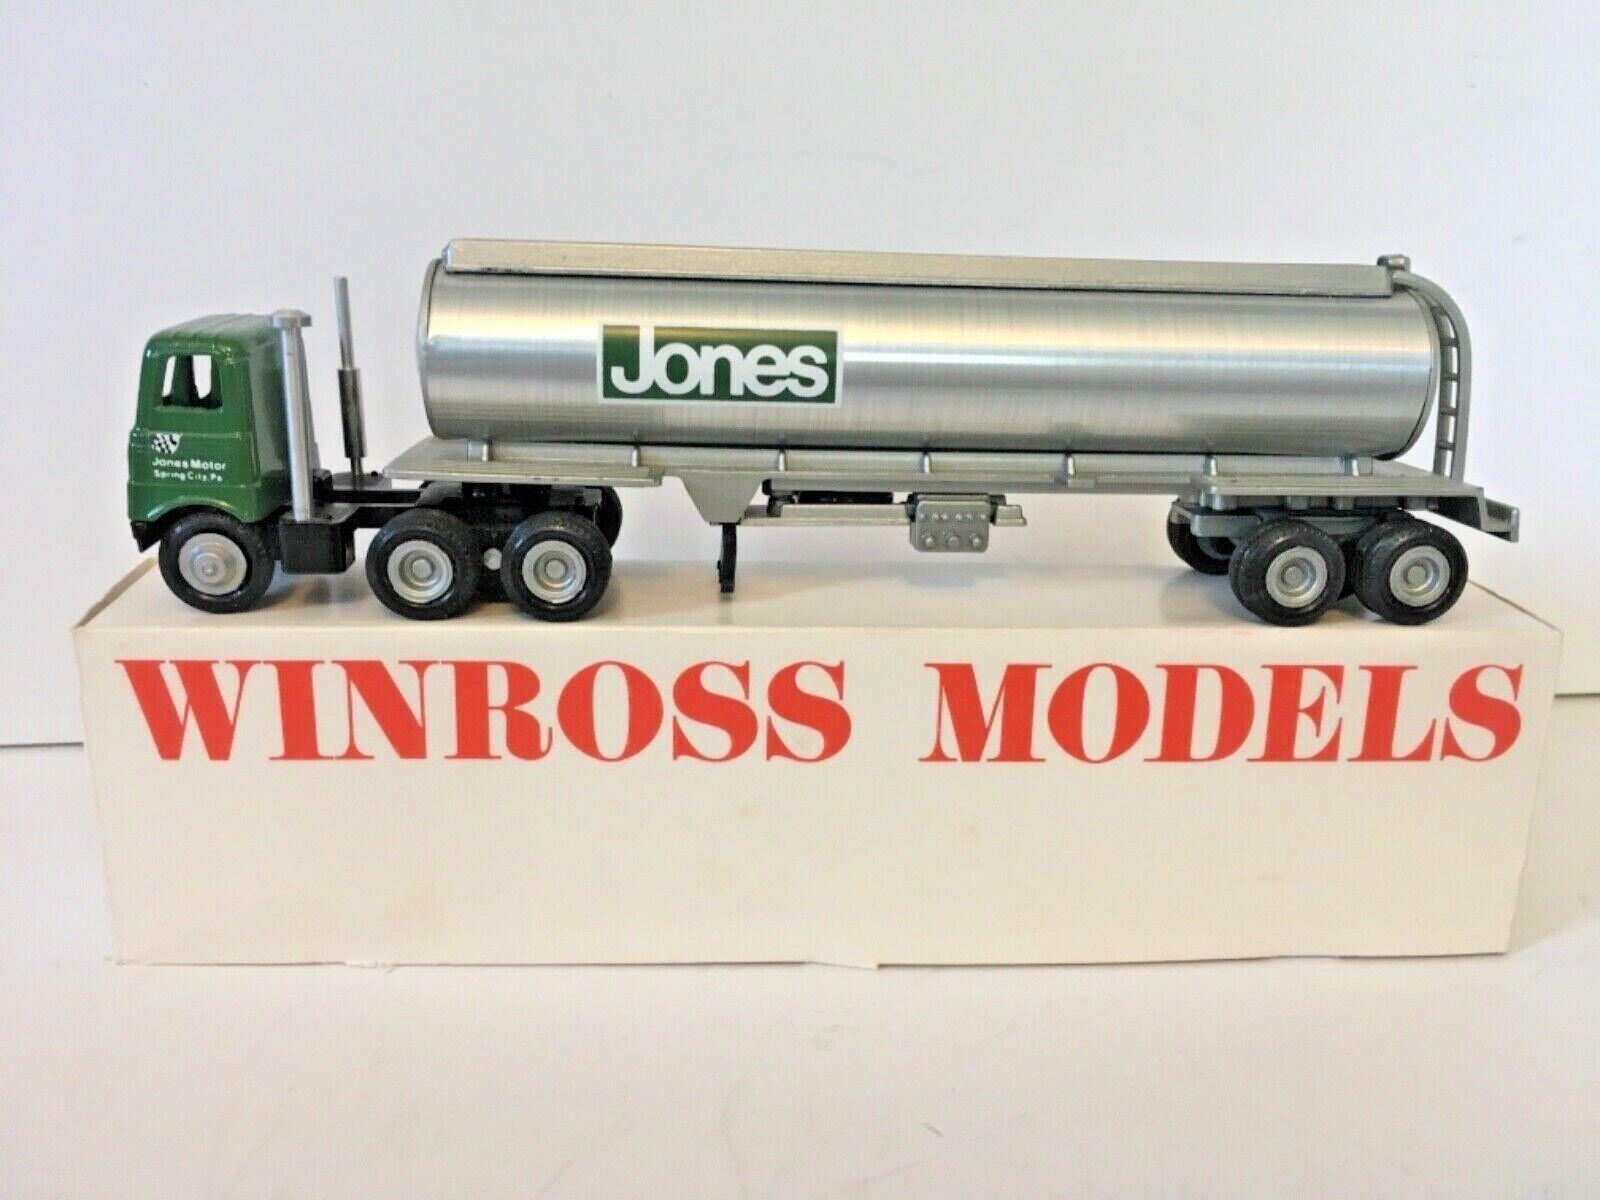 Jones Motor Tanker '78 Model Winross 1 64th Scale Tractor Trailer